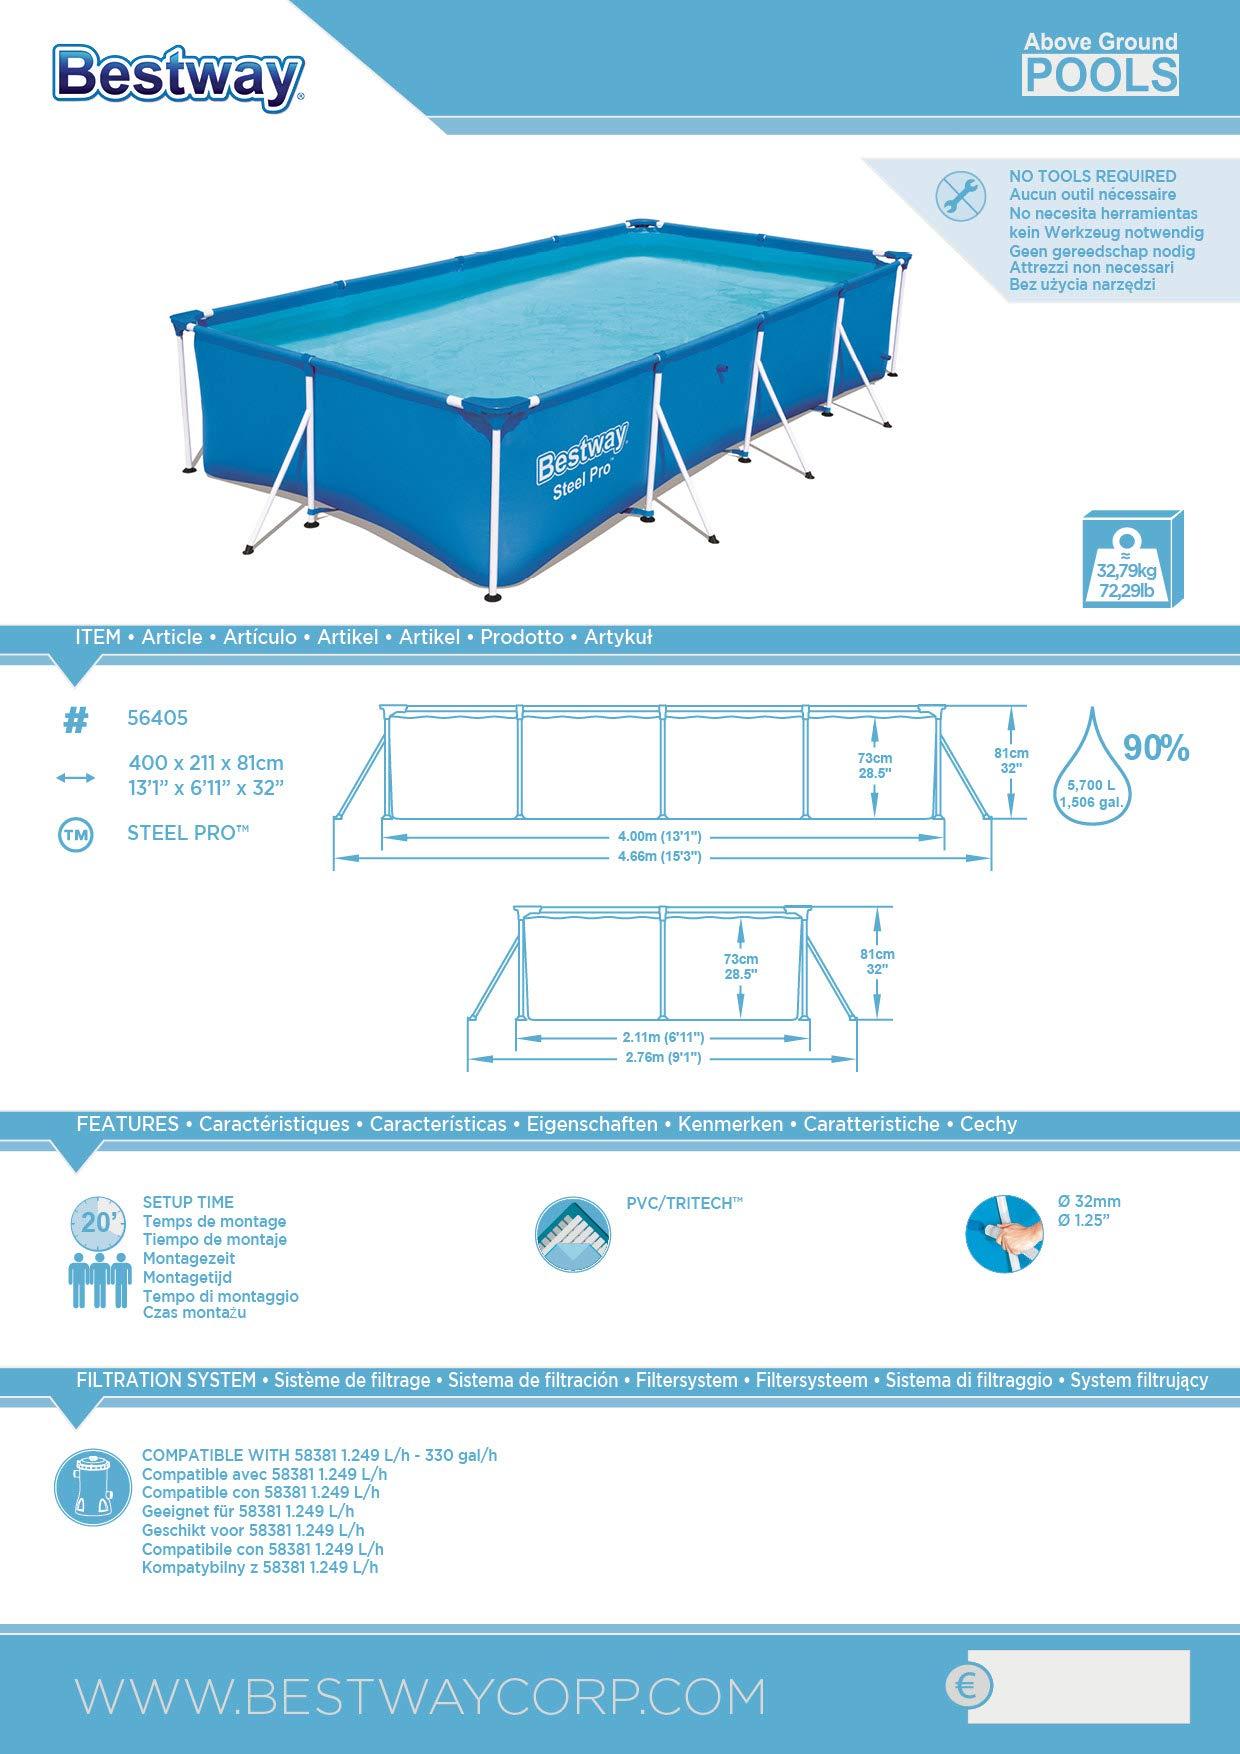 Bestway Steel Pro 56405 – Piscina (Piscina con Anillo Hinchable, Rectangular, 5700 L, Azul, PVC, Acero)